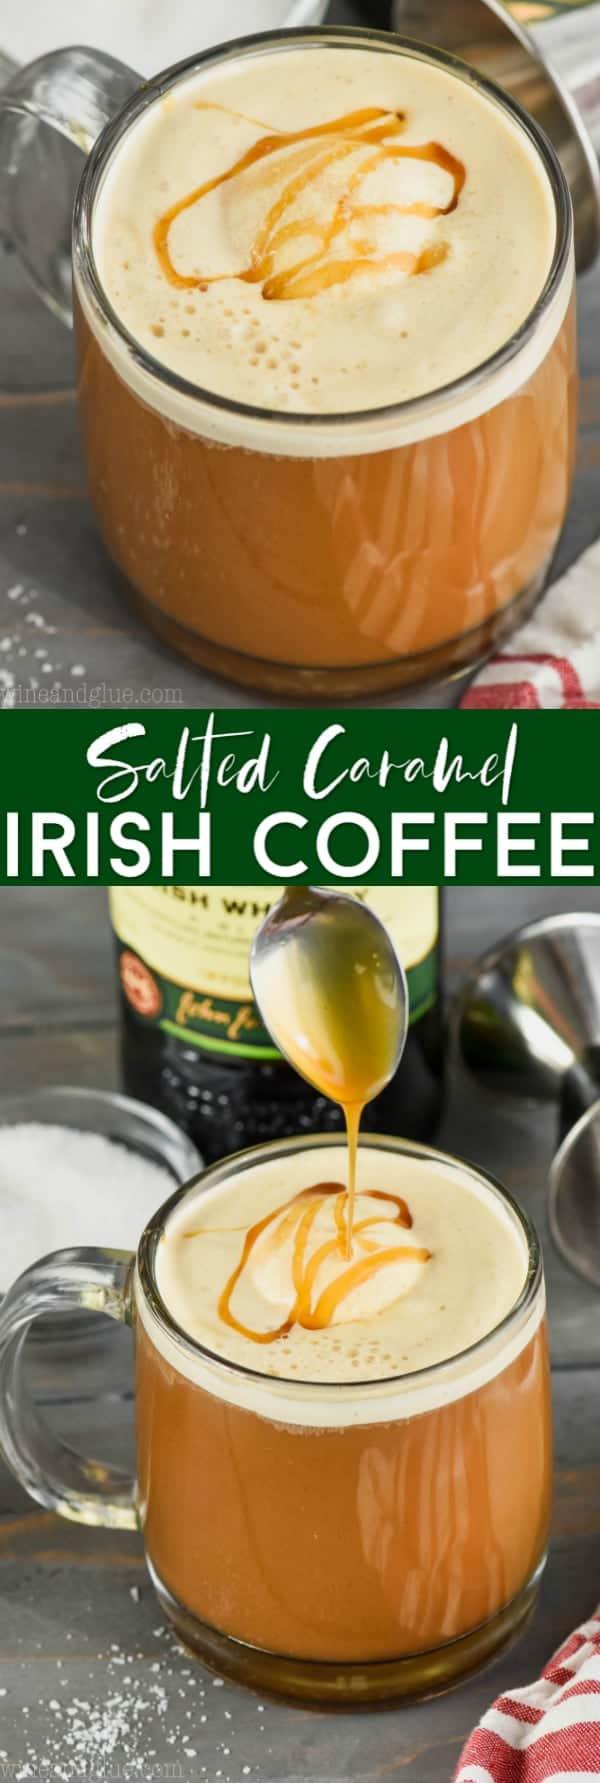 collage of photos of salted caramel irish coffee recipe